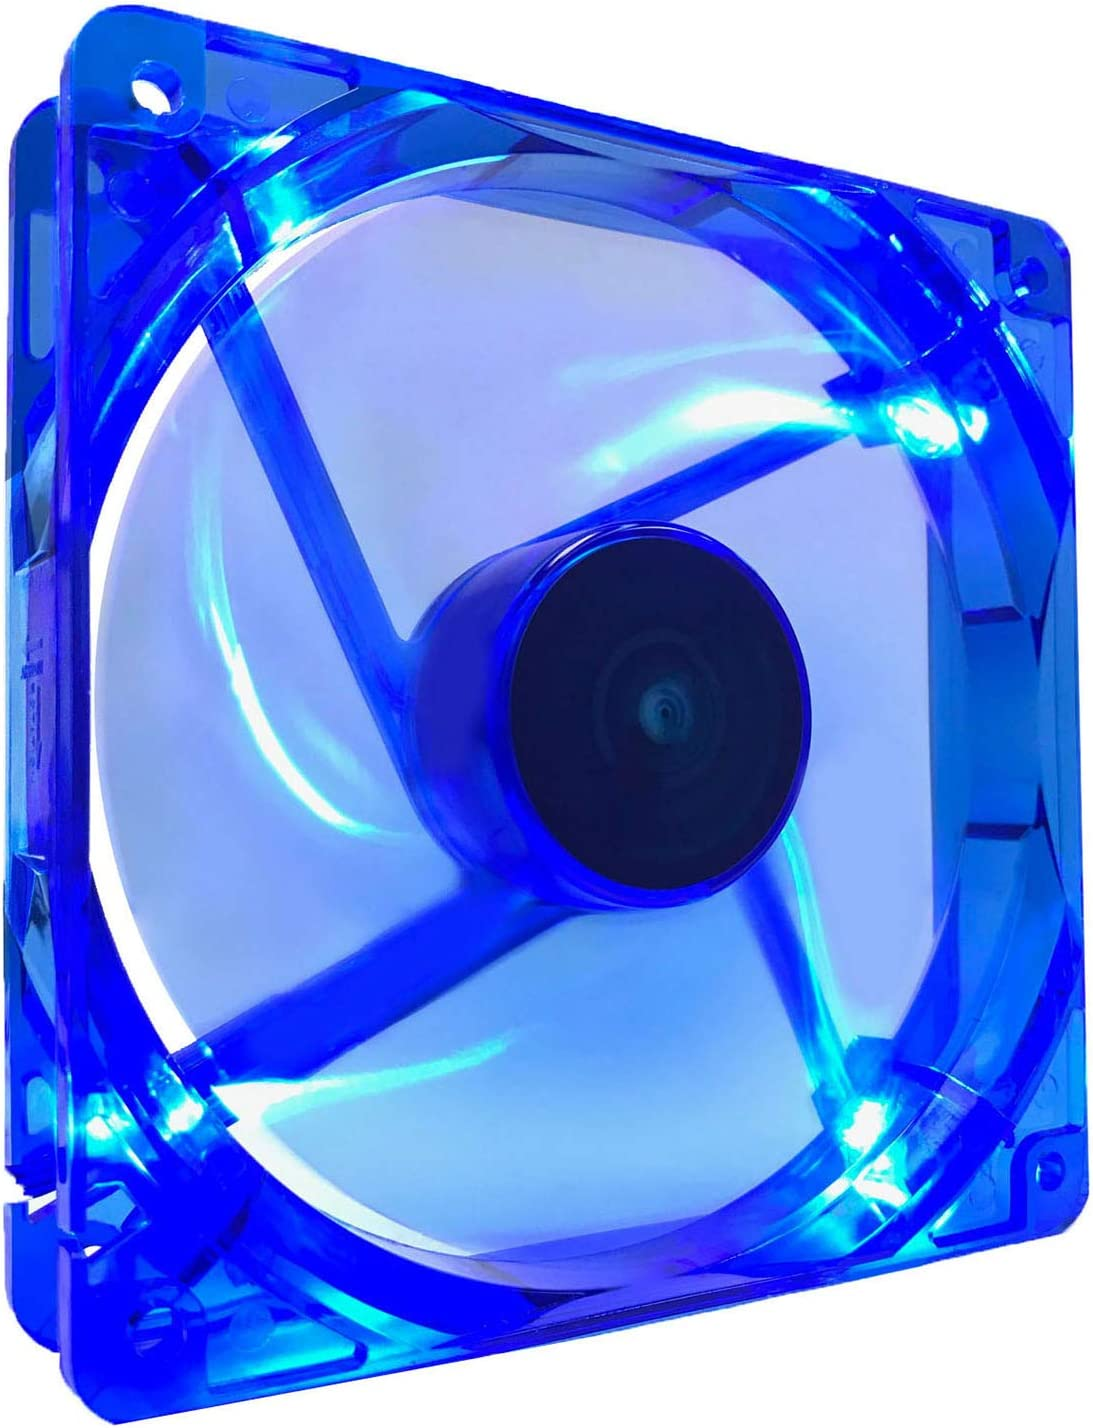 APEVIA CF12SL-UBL 120mm 4pin Molex + 3pin Motherboard Ultra Blue LED Case Fan